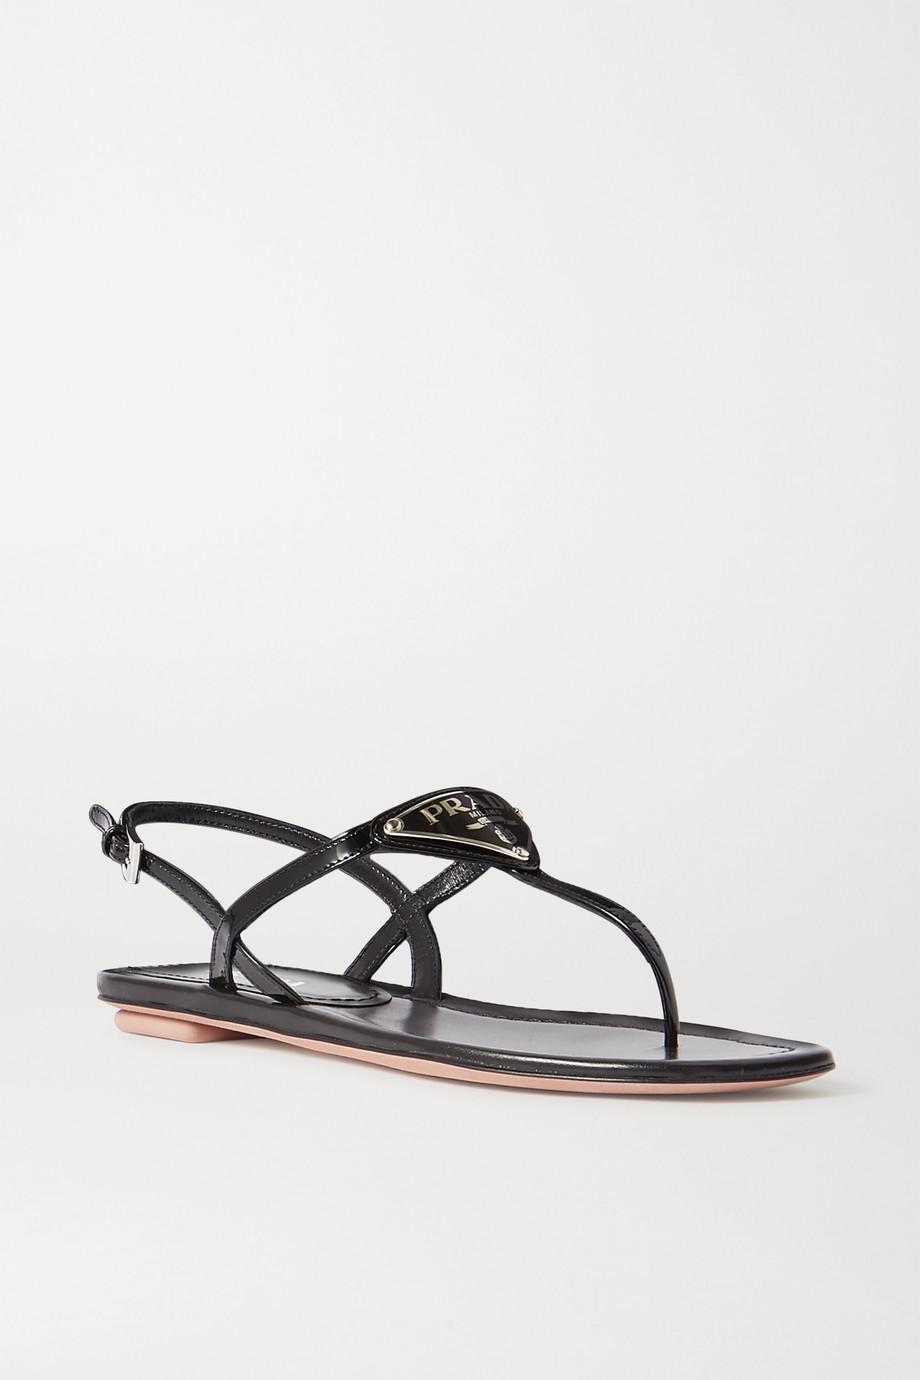 Prada Sandalen aus Lackleder mit Logoapplikation